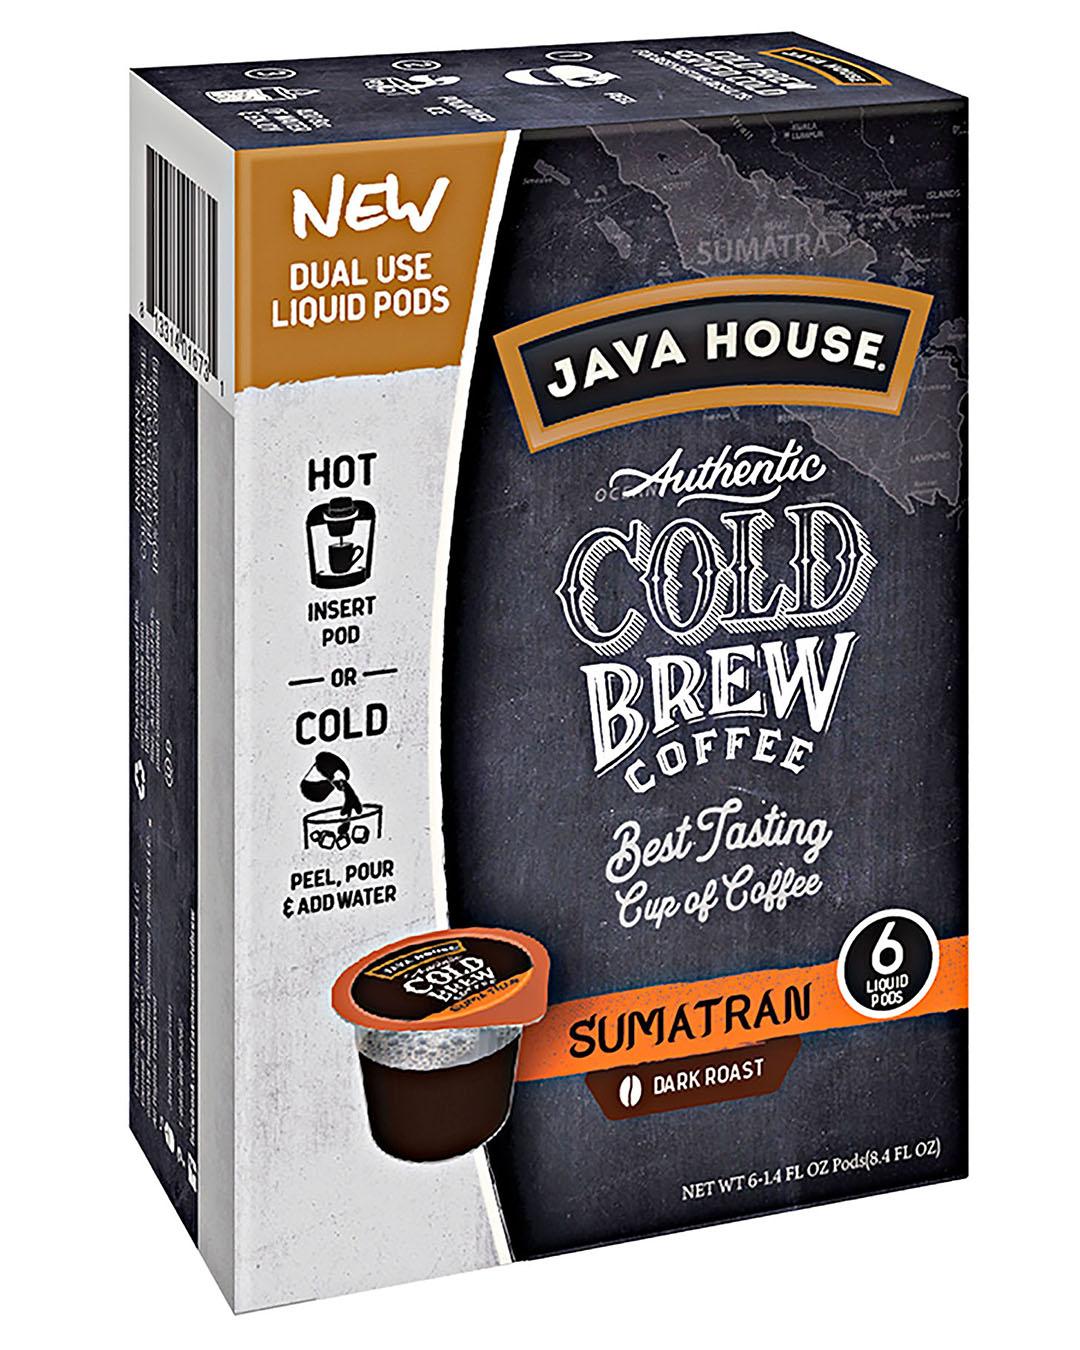 java house sumatran cold brew coffee dual use liquid pods